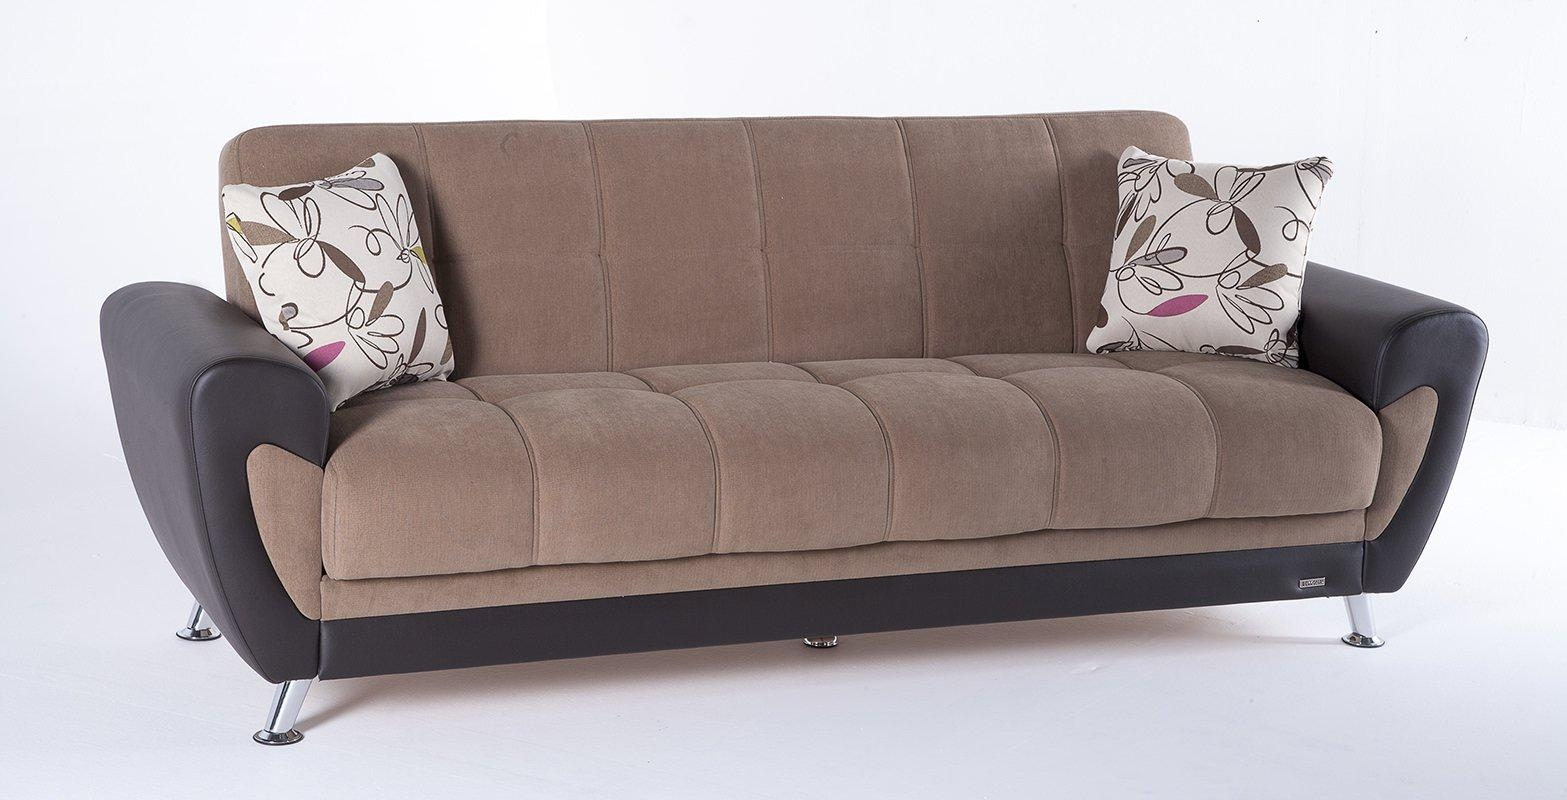 20 ideas of sofa beds chairs sofa ideas. Black Bedroom Furniture Sets. Home Design Ideas